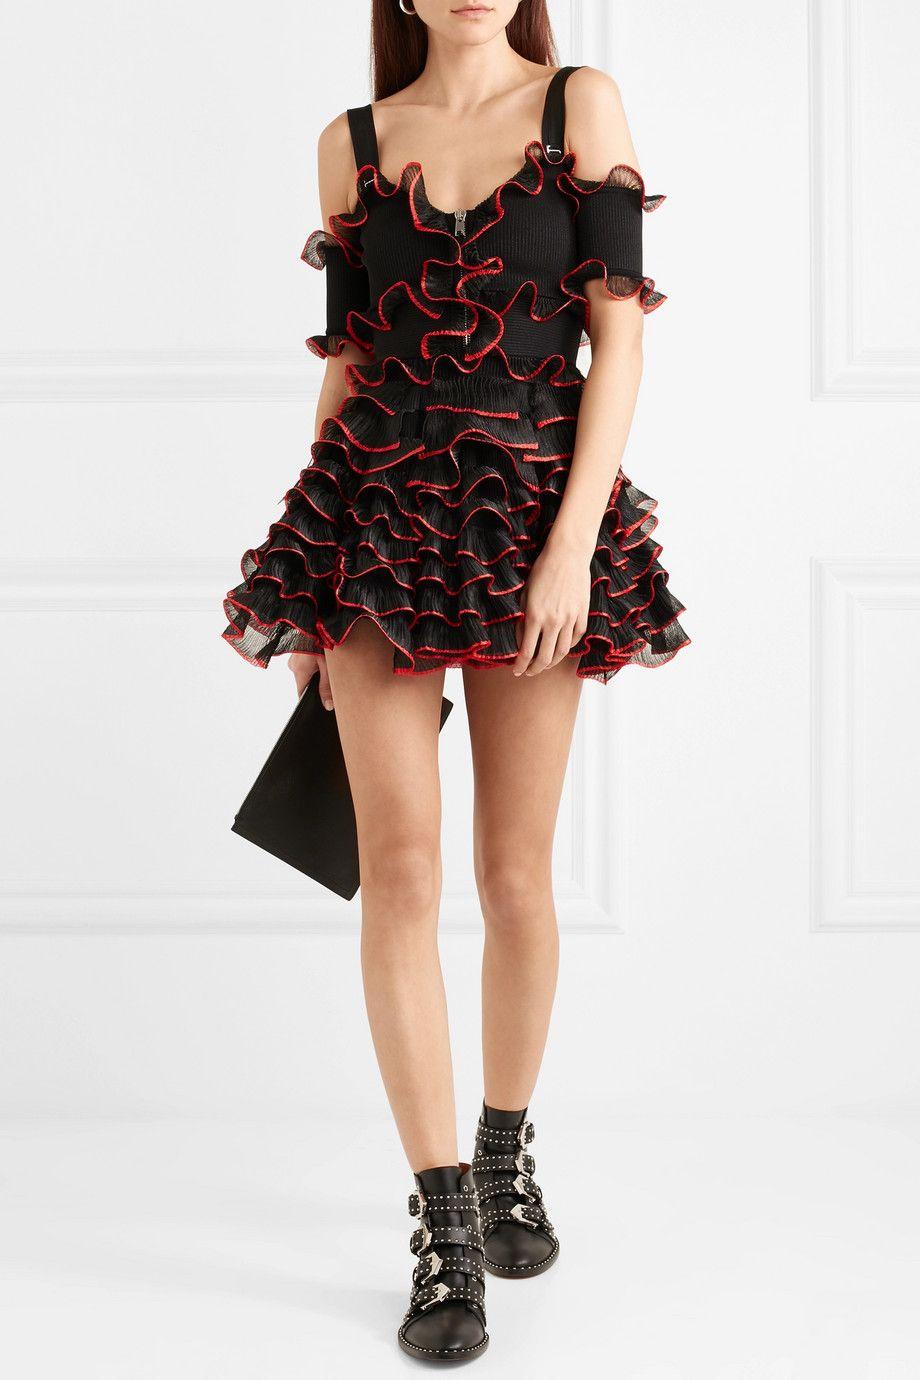 Buy Cheap Shop Very Cheap Price Cold-shoulder Ruffled Stretch-knit Mini Dress - Black Alexander McQueen WCVaqTuJLn